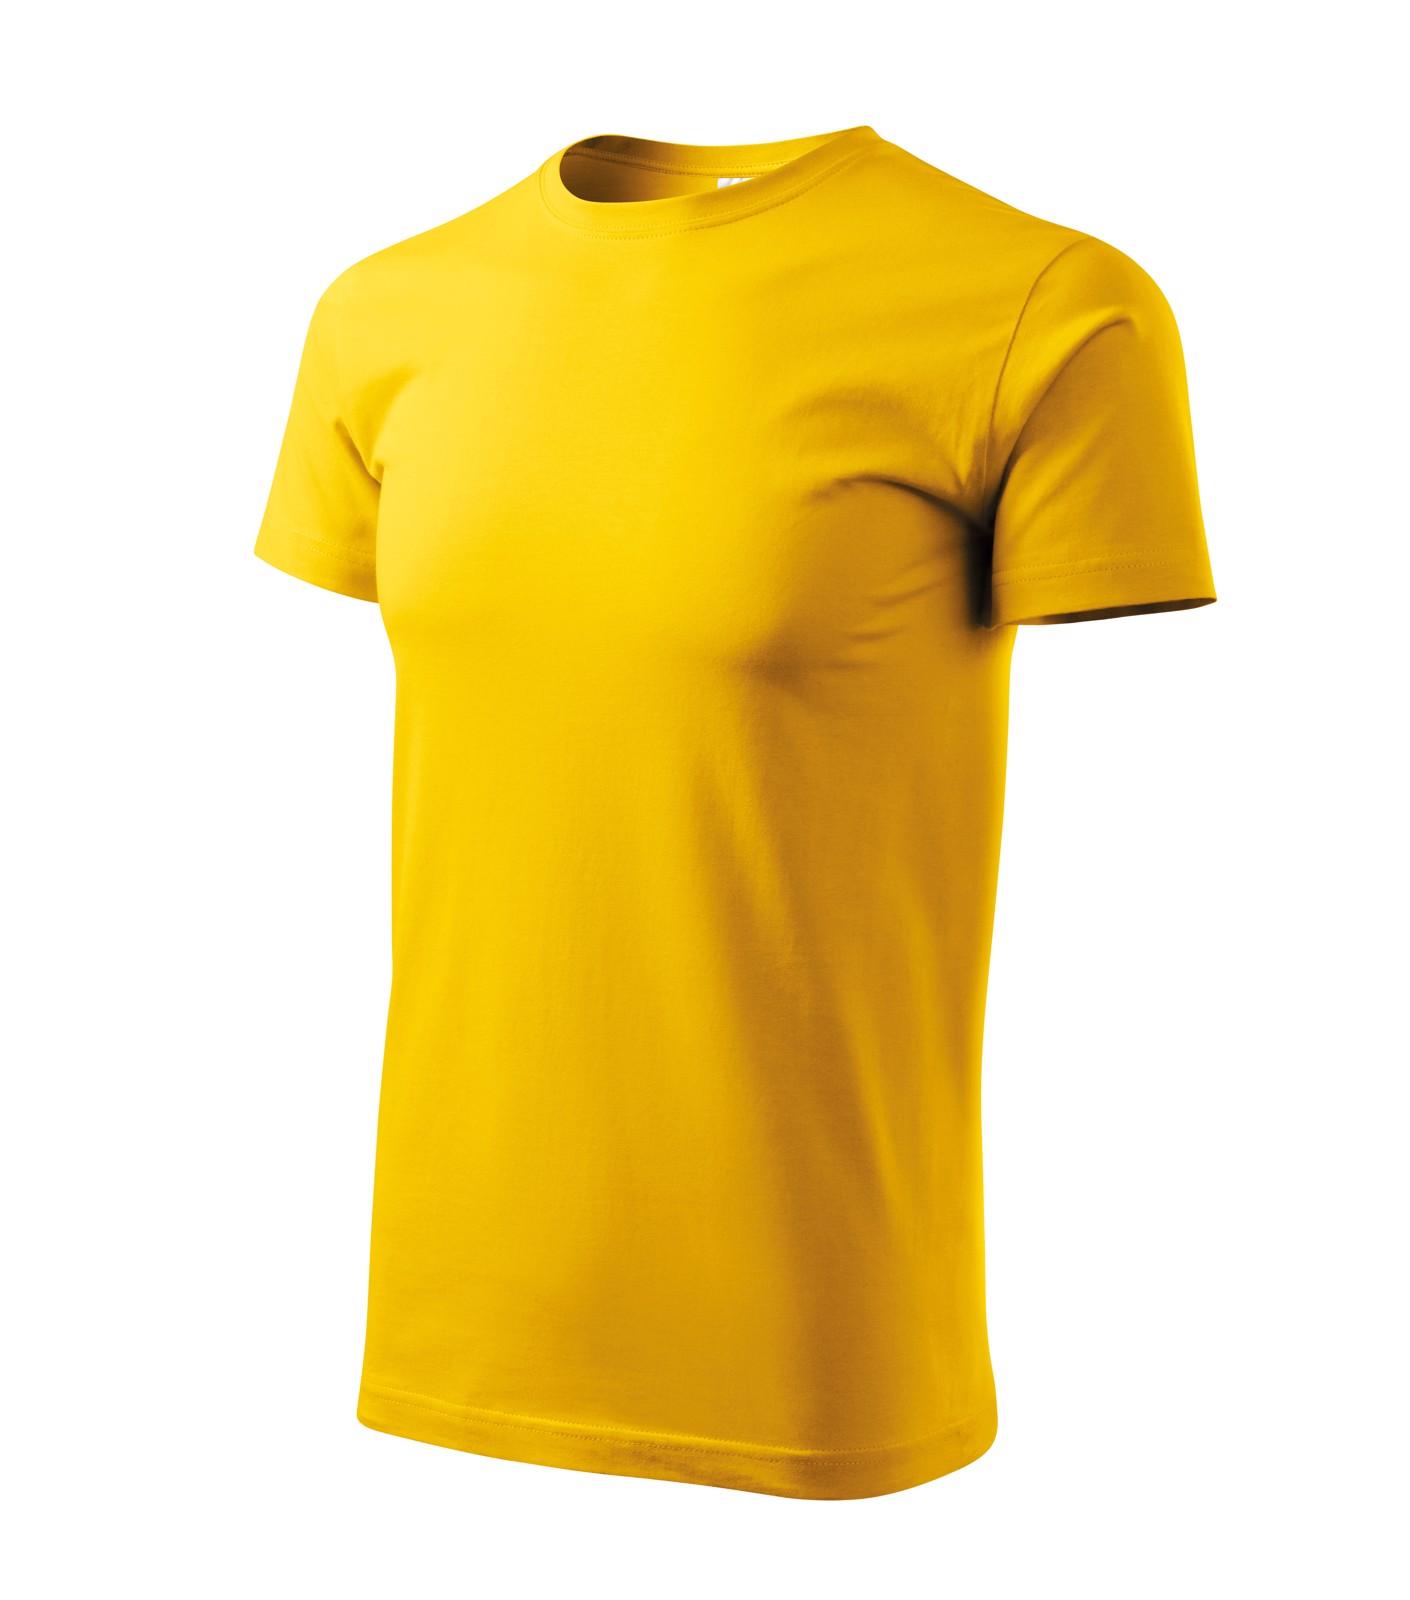 Tričko unisex Malfini Heavy New - Žlutá / 2XL